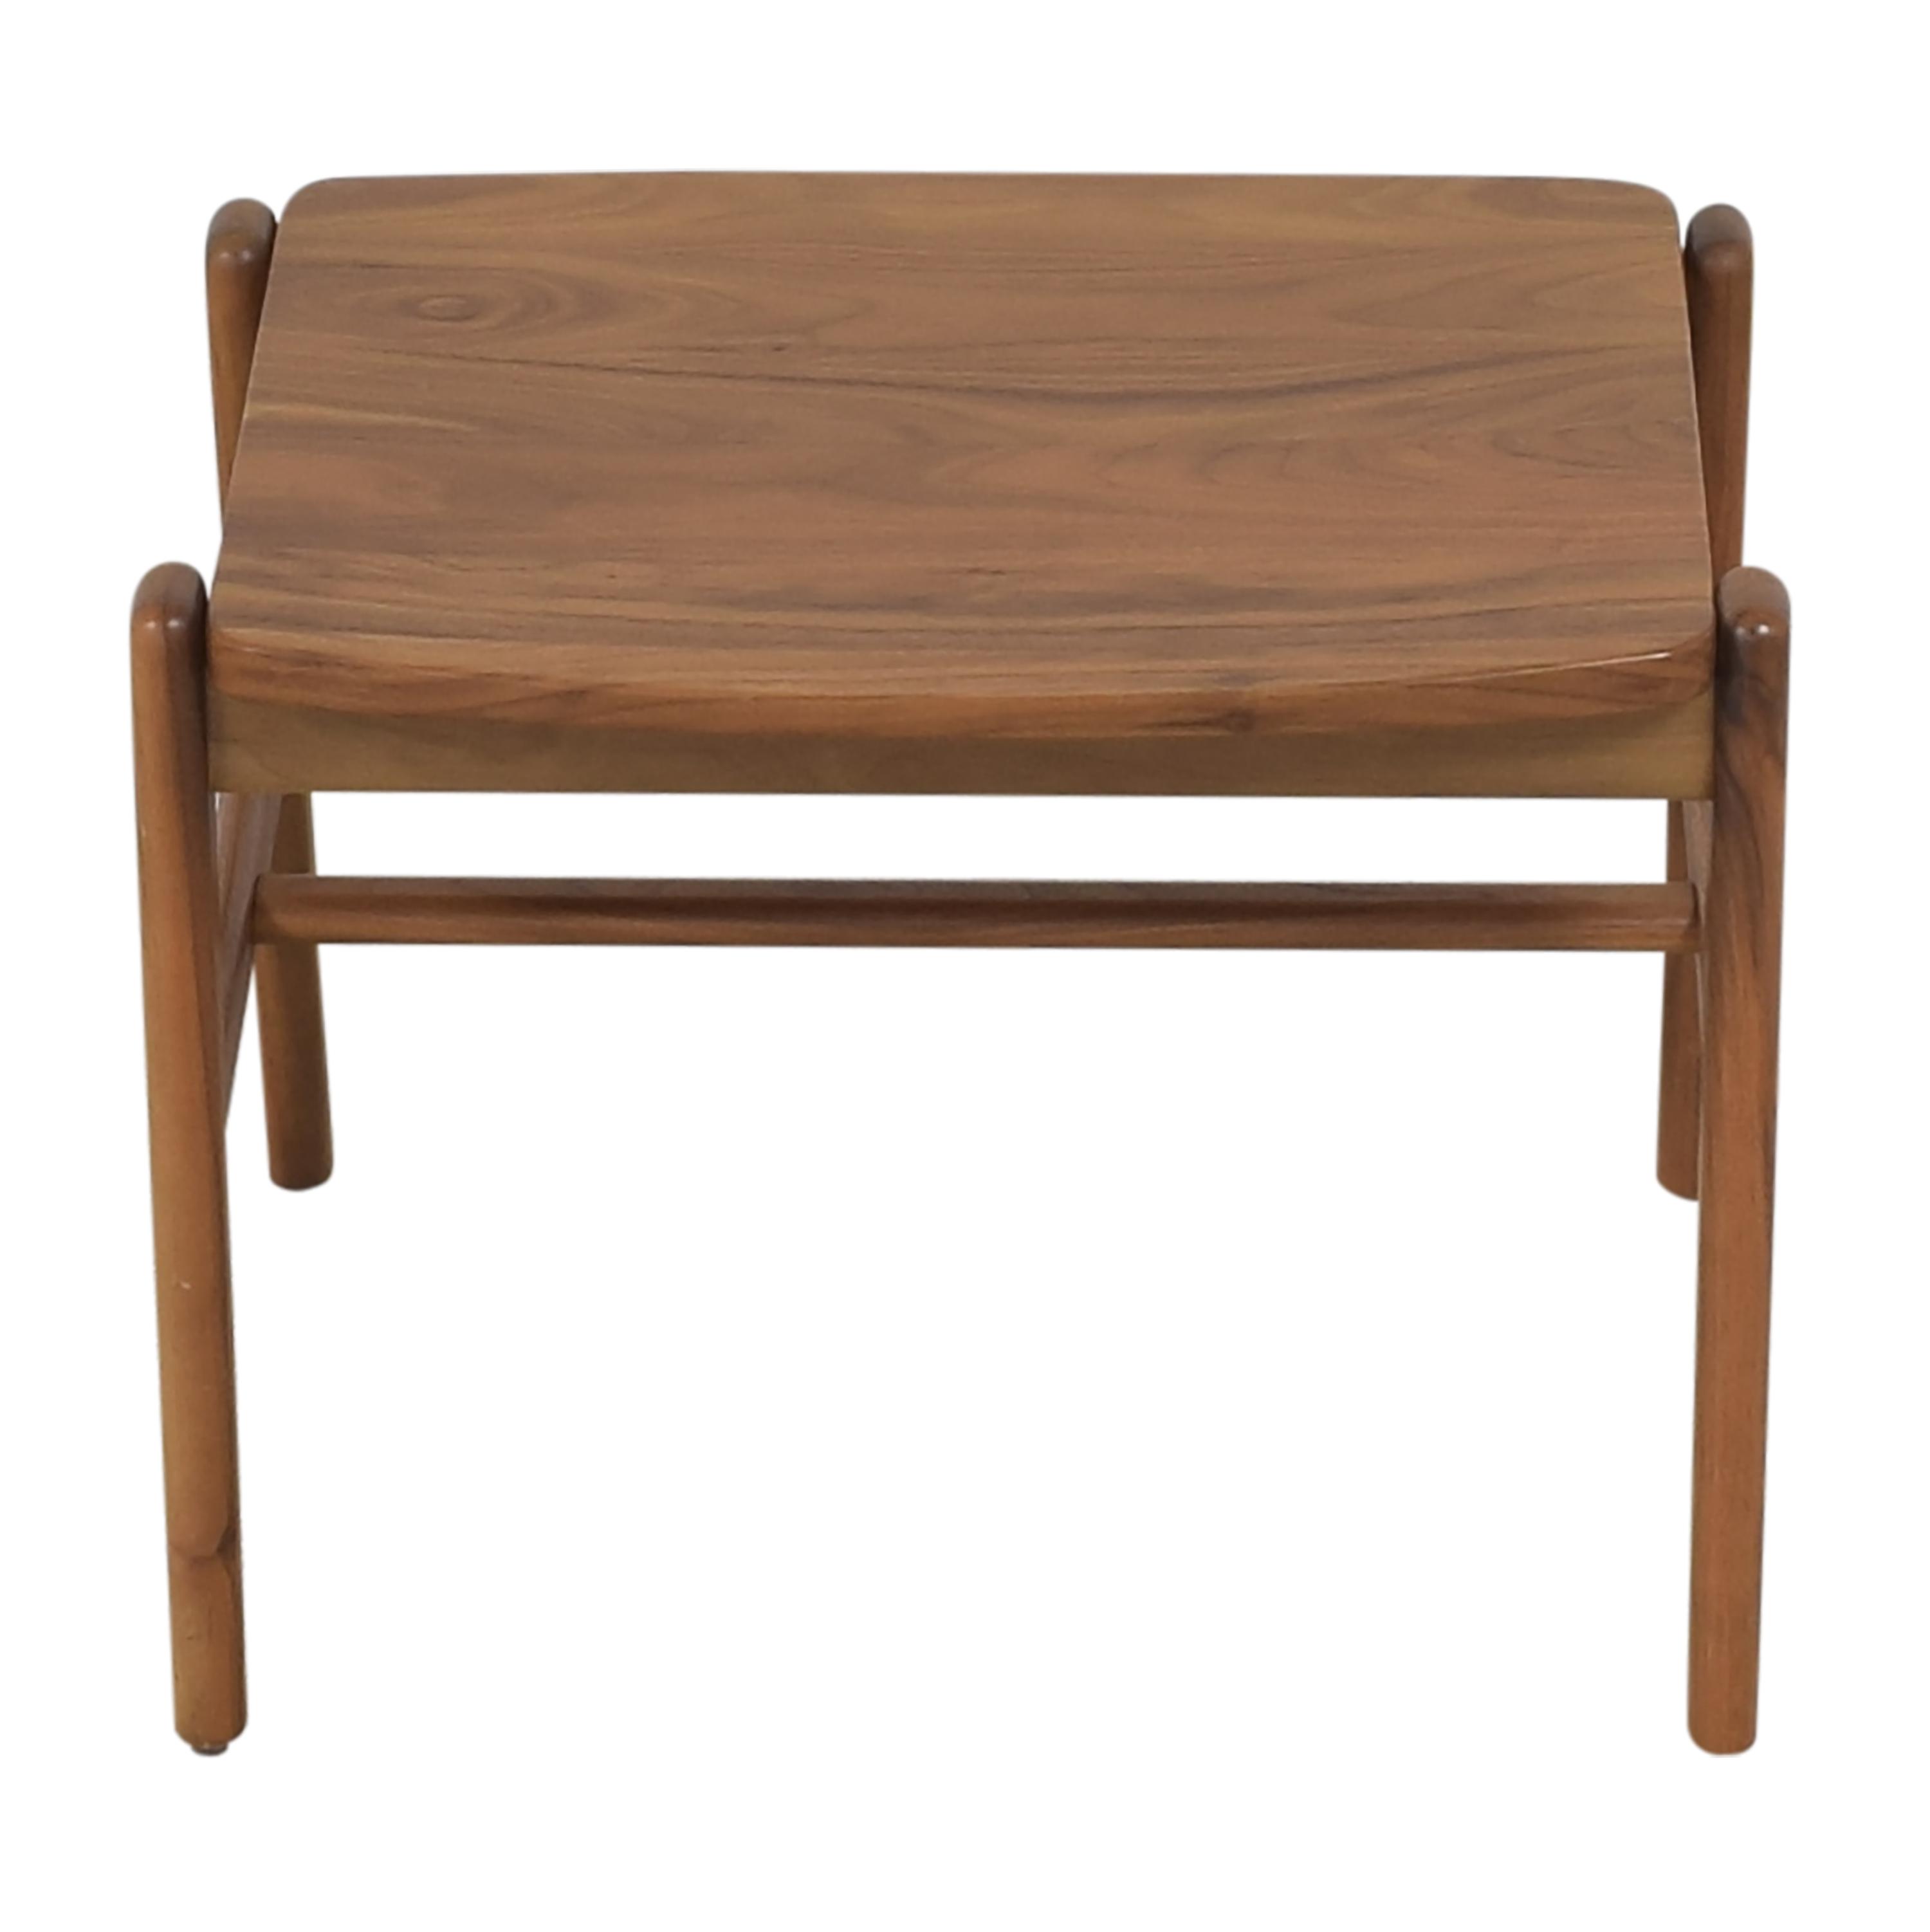 buy Room & Board Evan Stool Room & Board Chairs